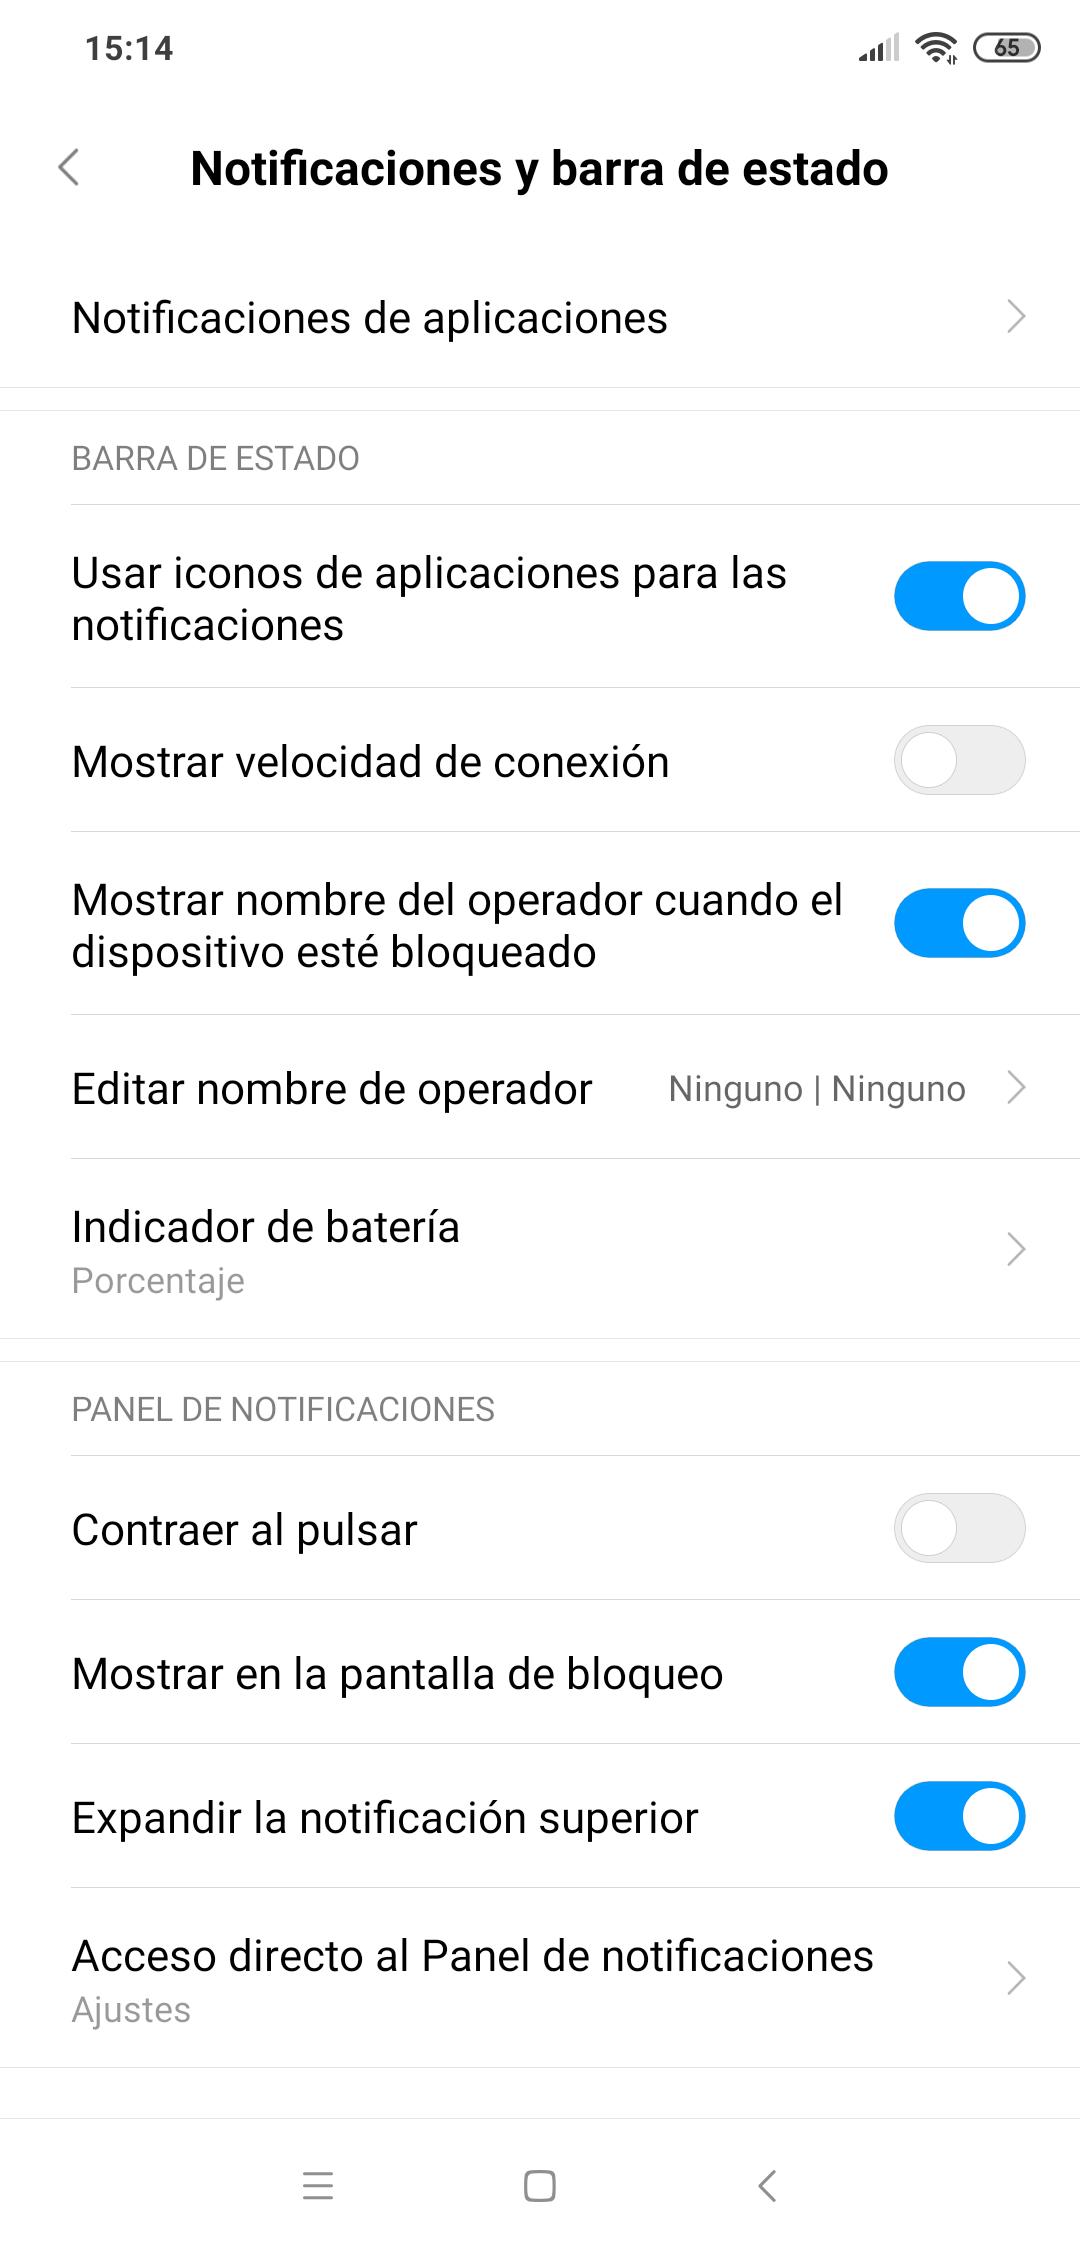 Screenshot_2018-10-26-15-14-22-908_com.android.settings.png